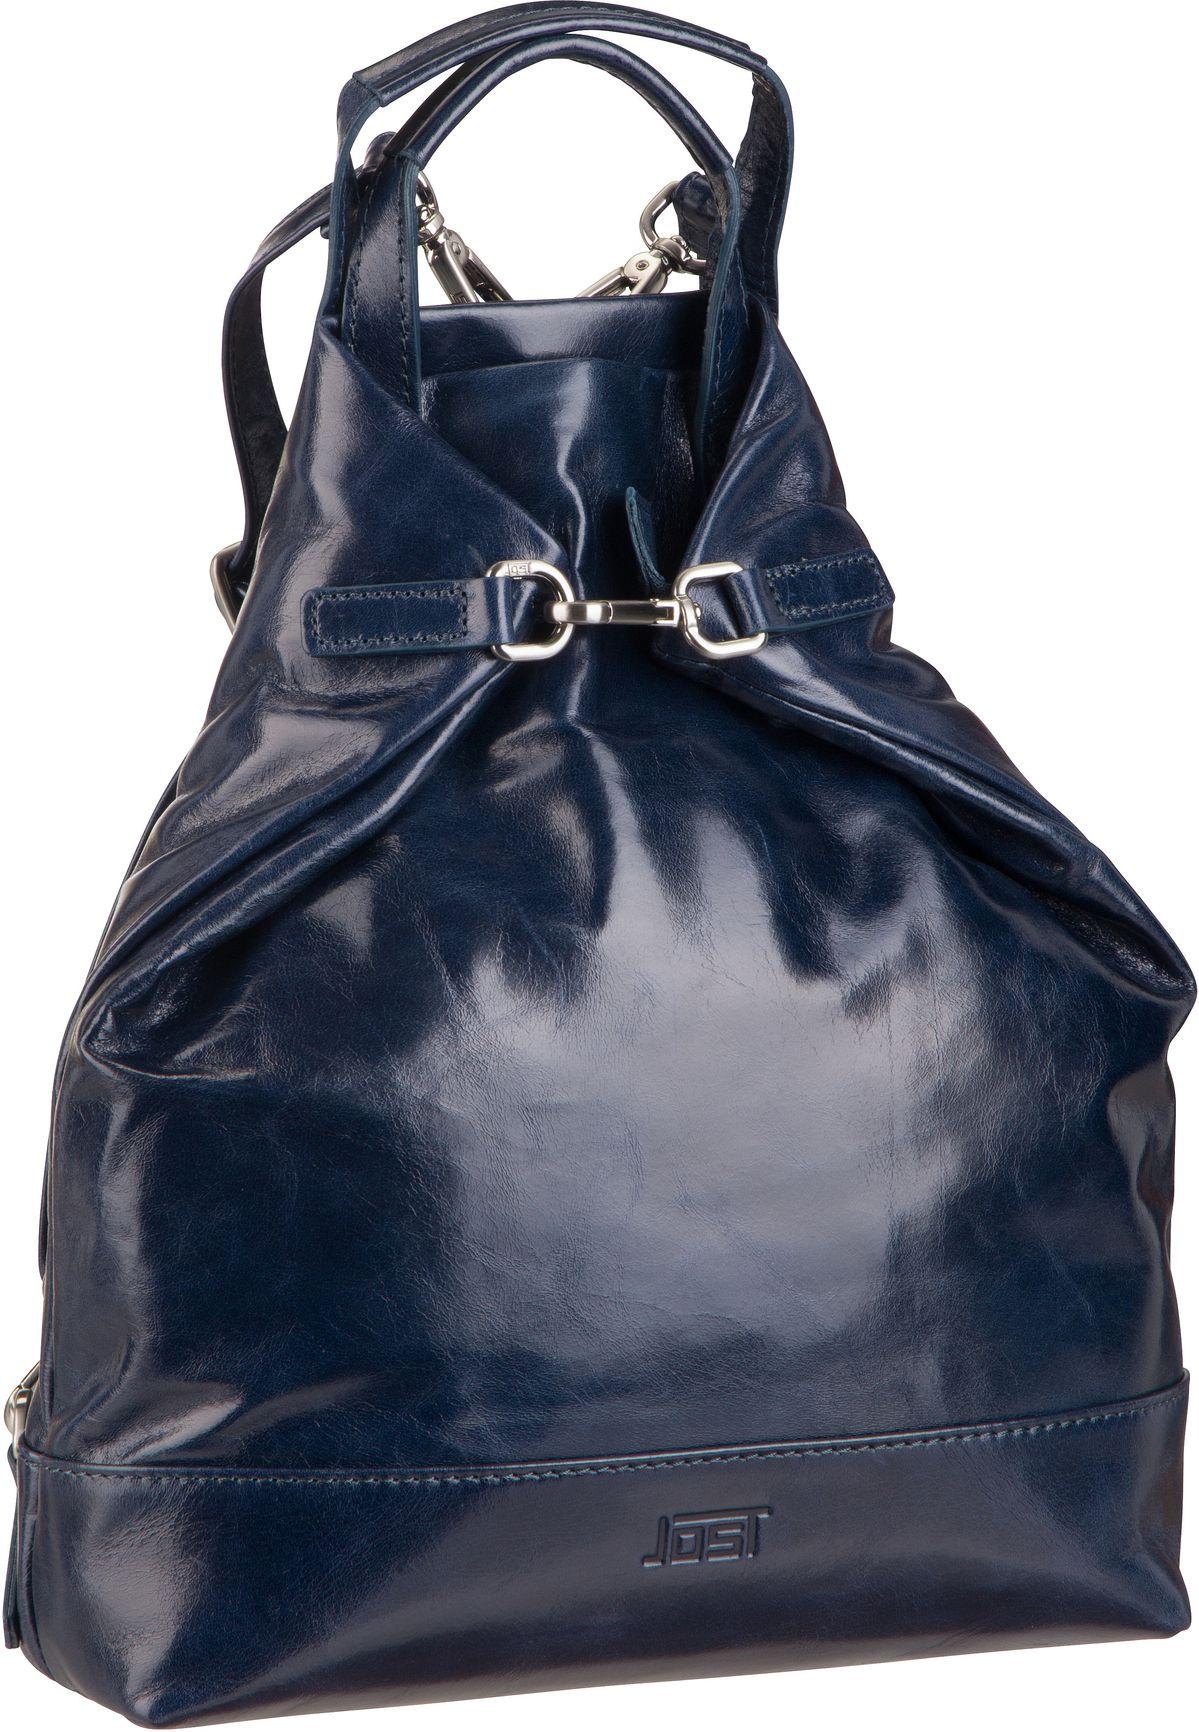 Rucksack / Daypack Boda 6624 X-Change Bag XS Navy